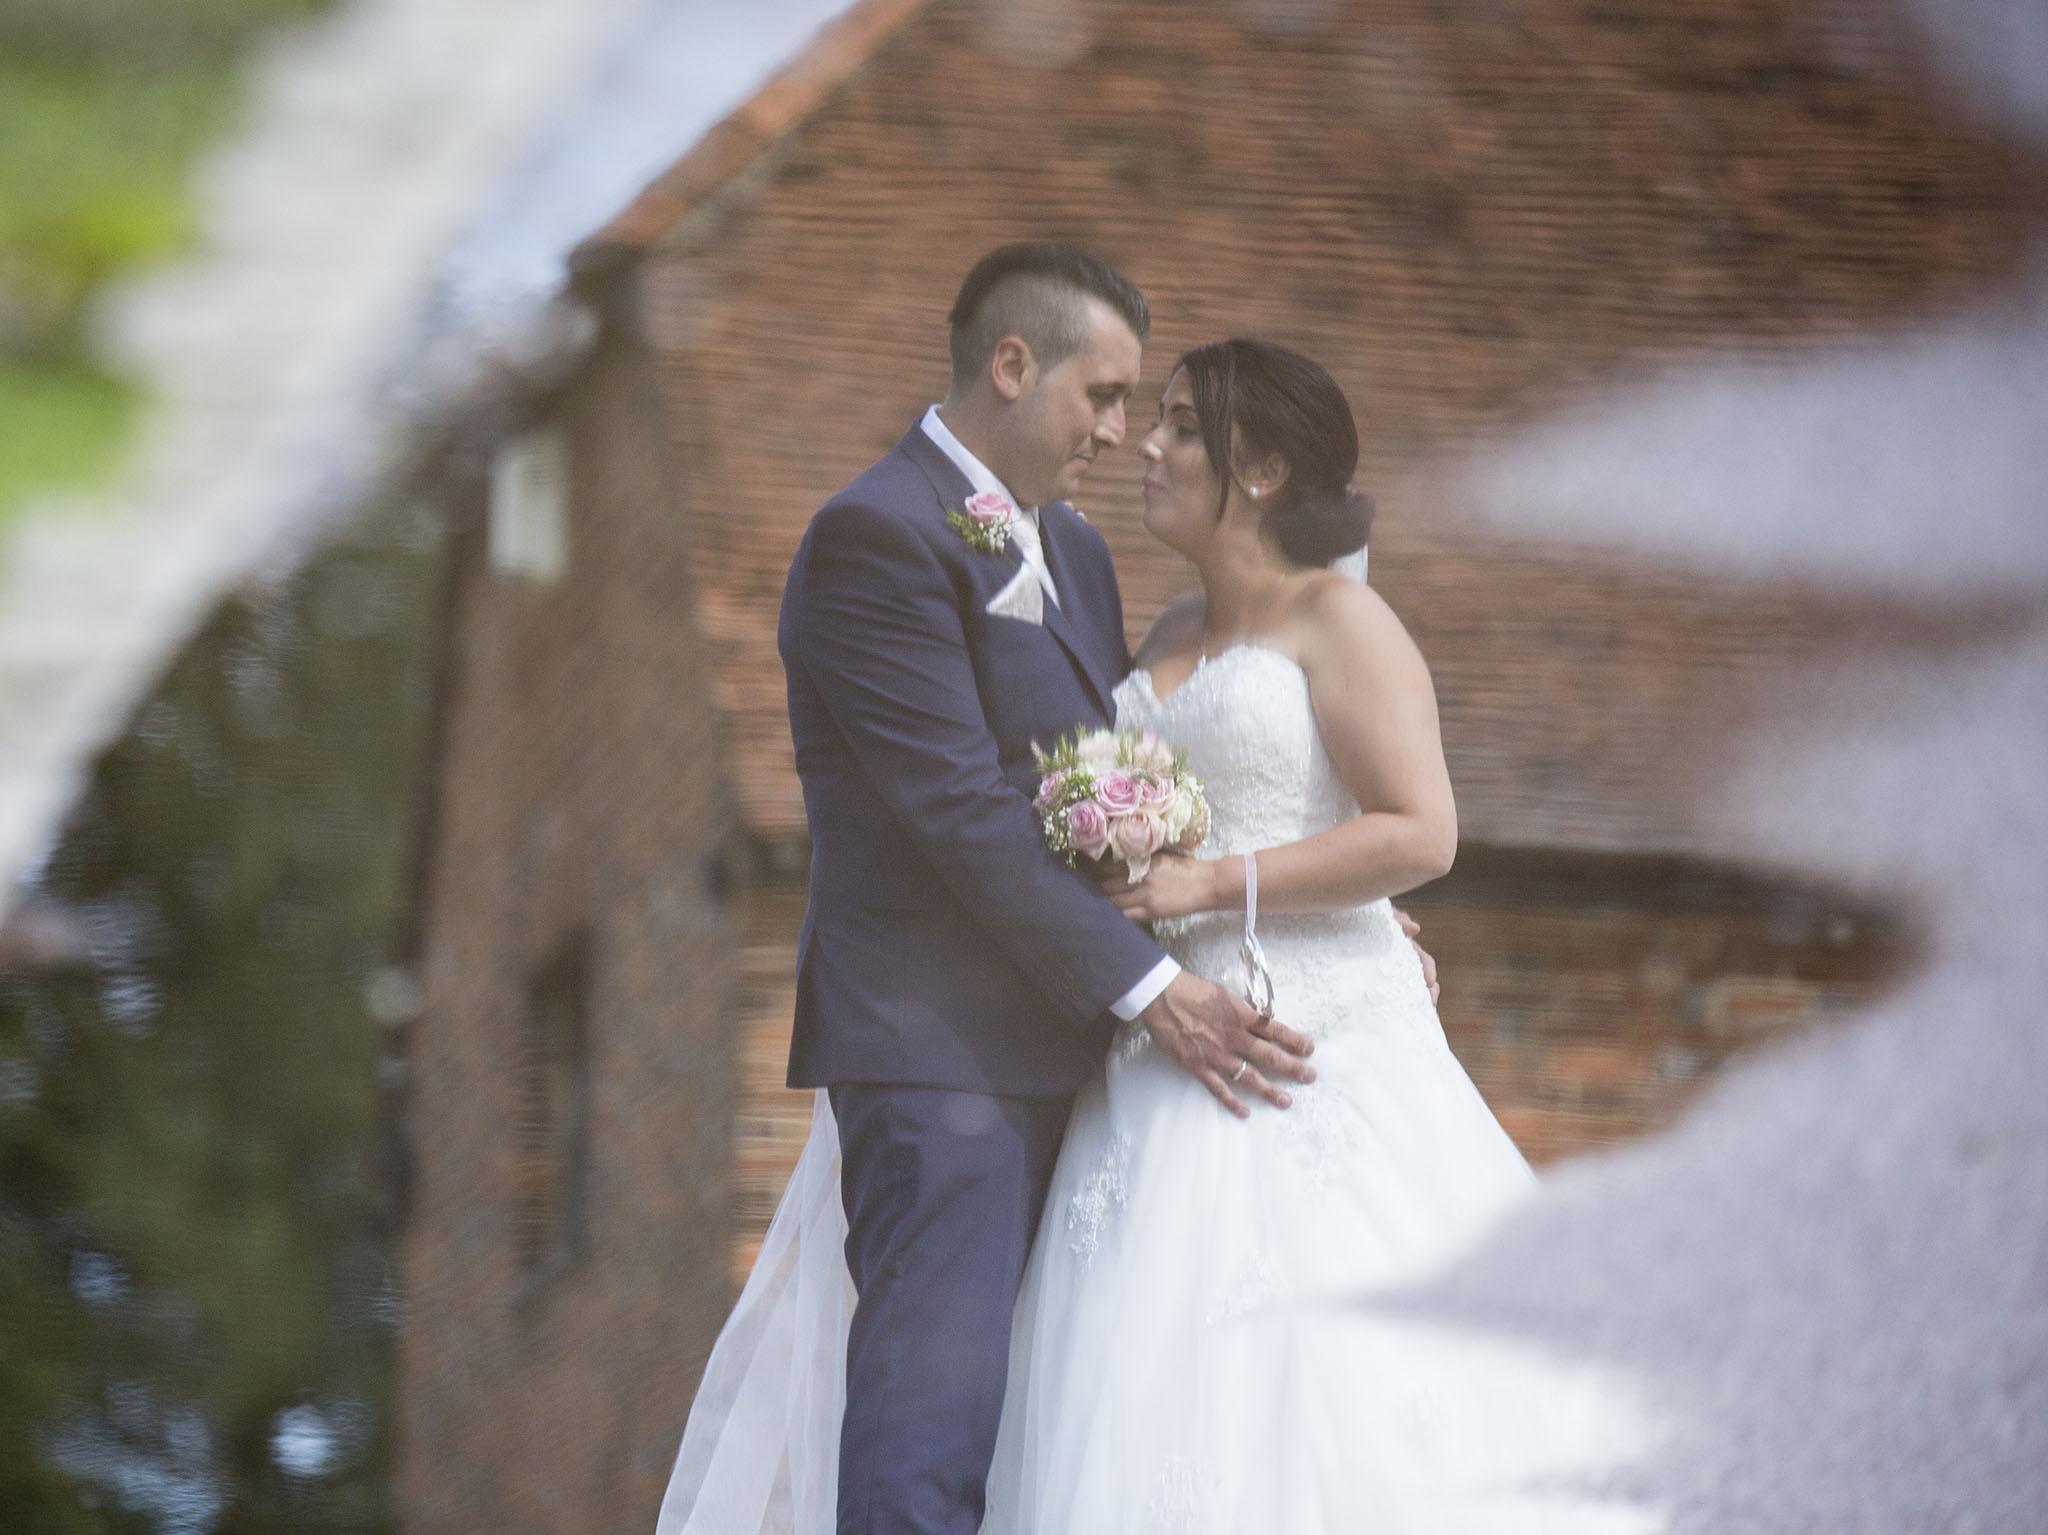 elizabethgphotography_kingslangley_hertfordshire_fineart_wedding_tewinbury_farm_tayna_26.jpg